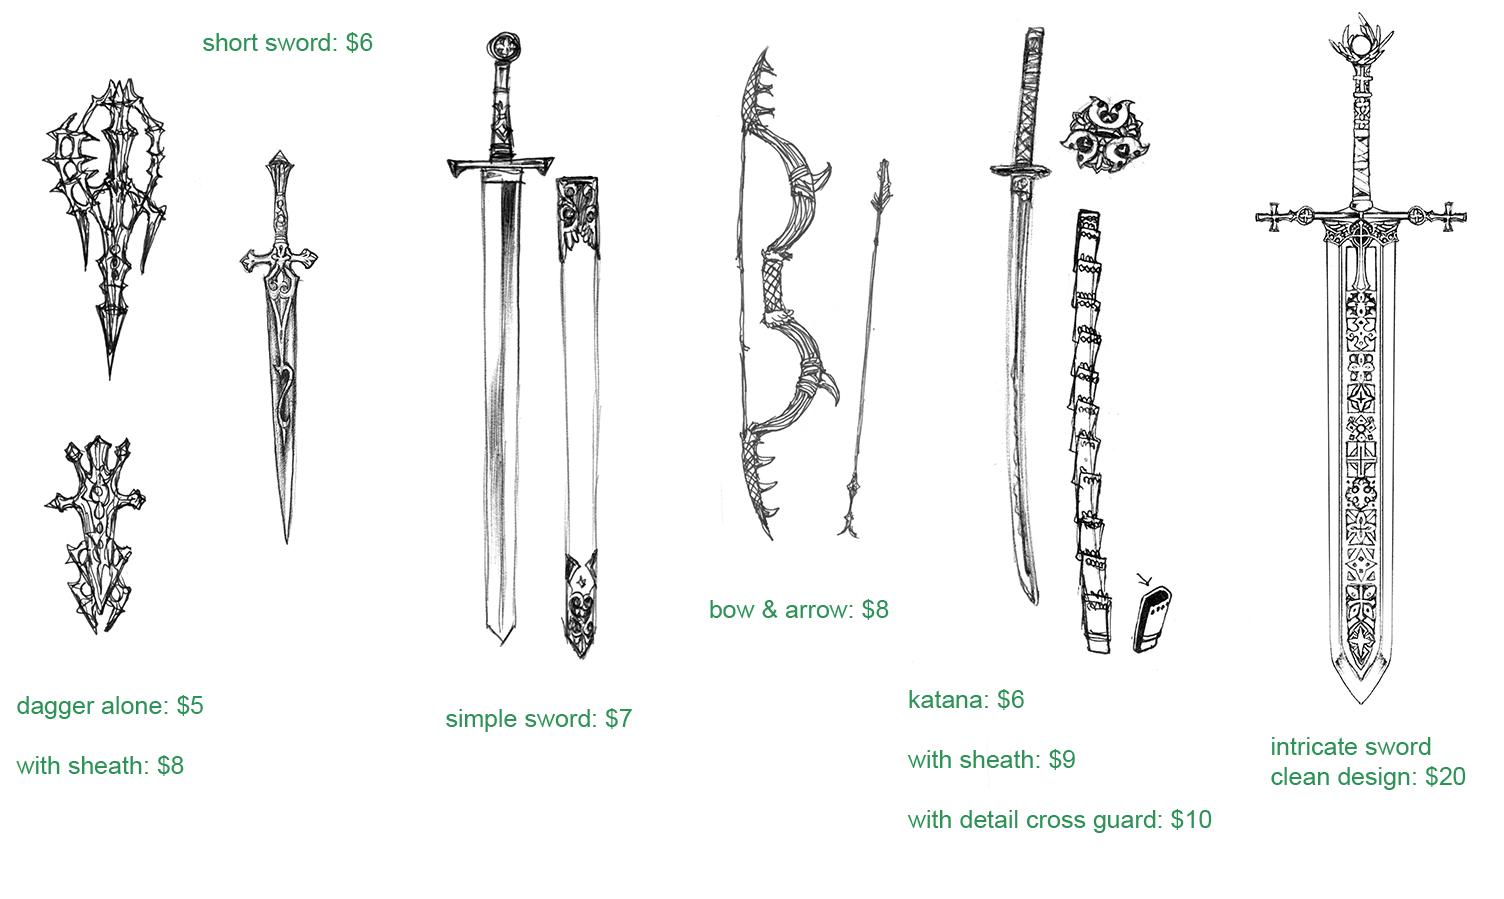 weapon sketch sample by Wen-M on DeviantArt